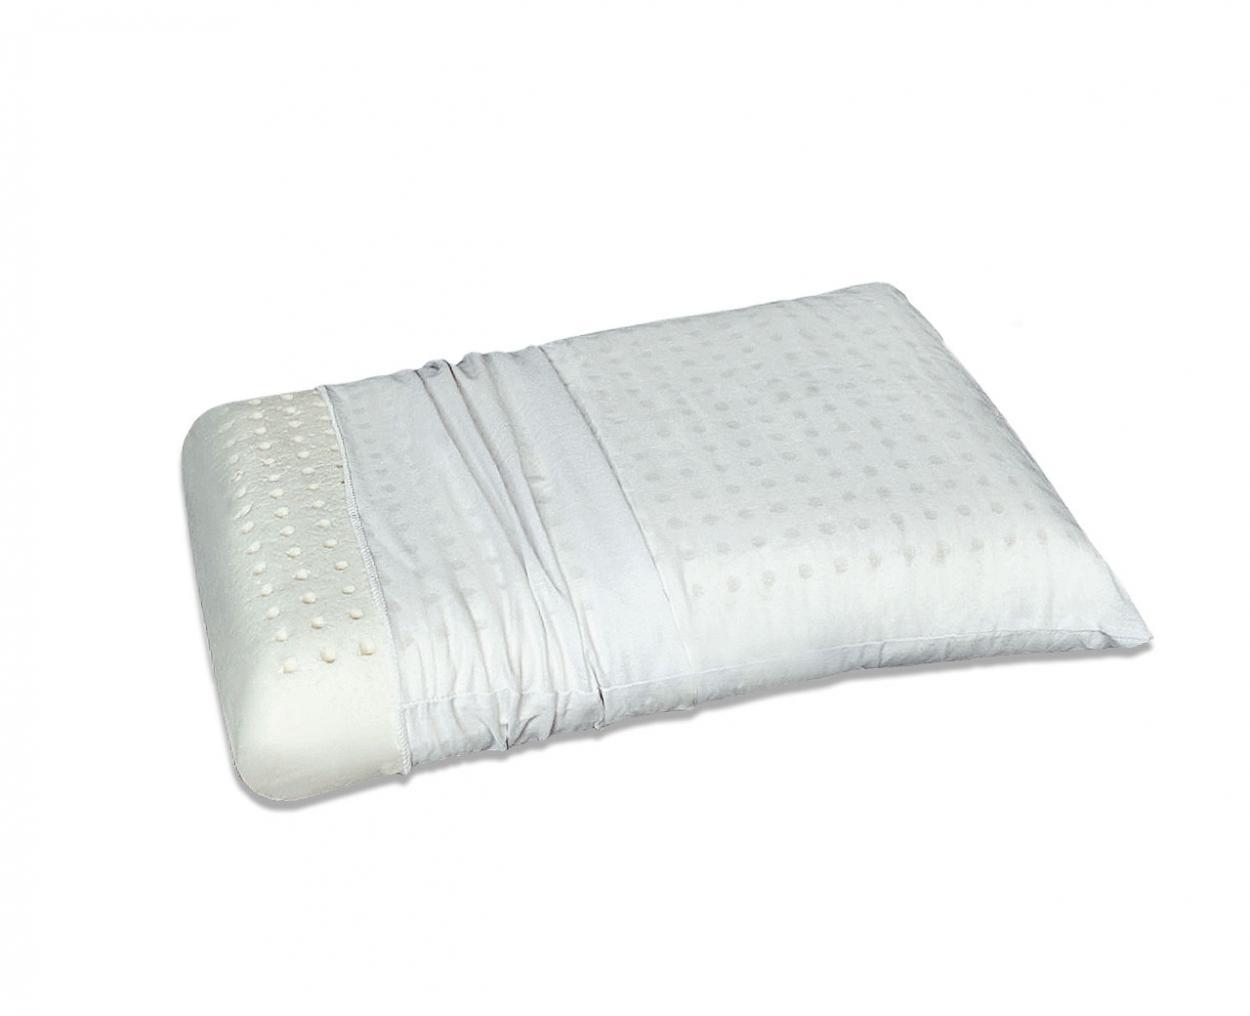 CandiaStrom - Μαξιλάρι Latex Comfort - Συλλογή NATURAL COLLECTION - Γενική Εικόνα